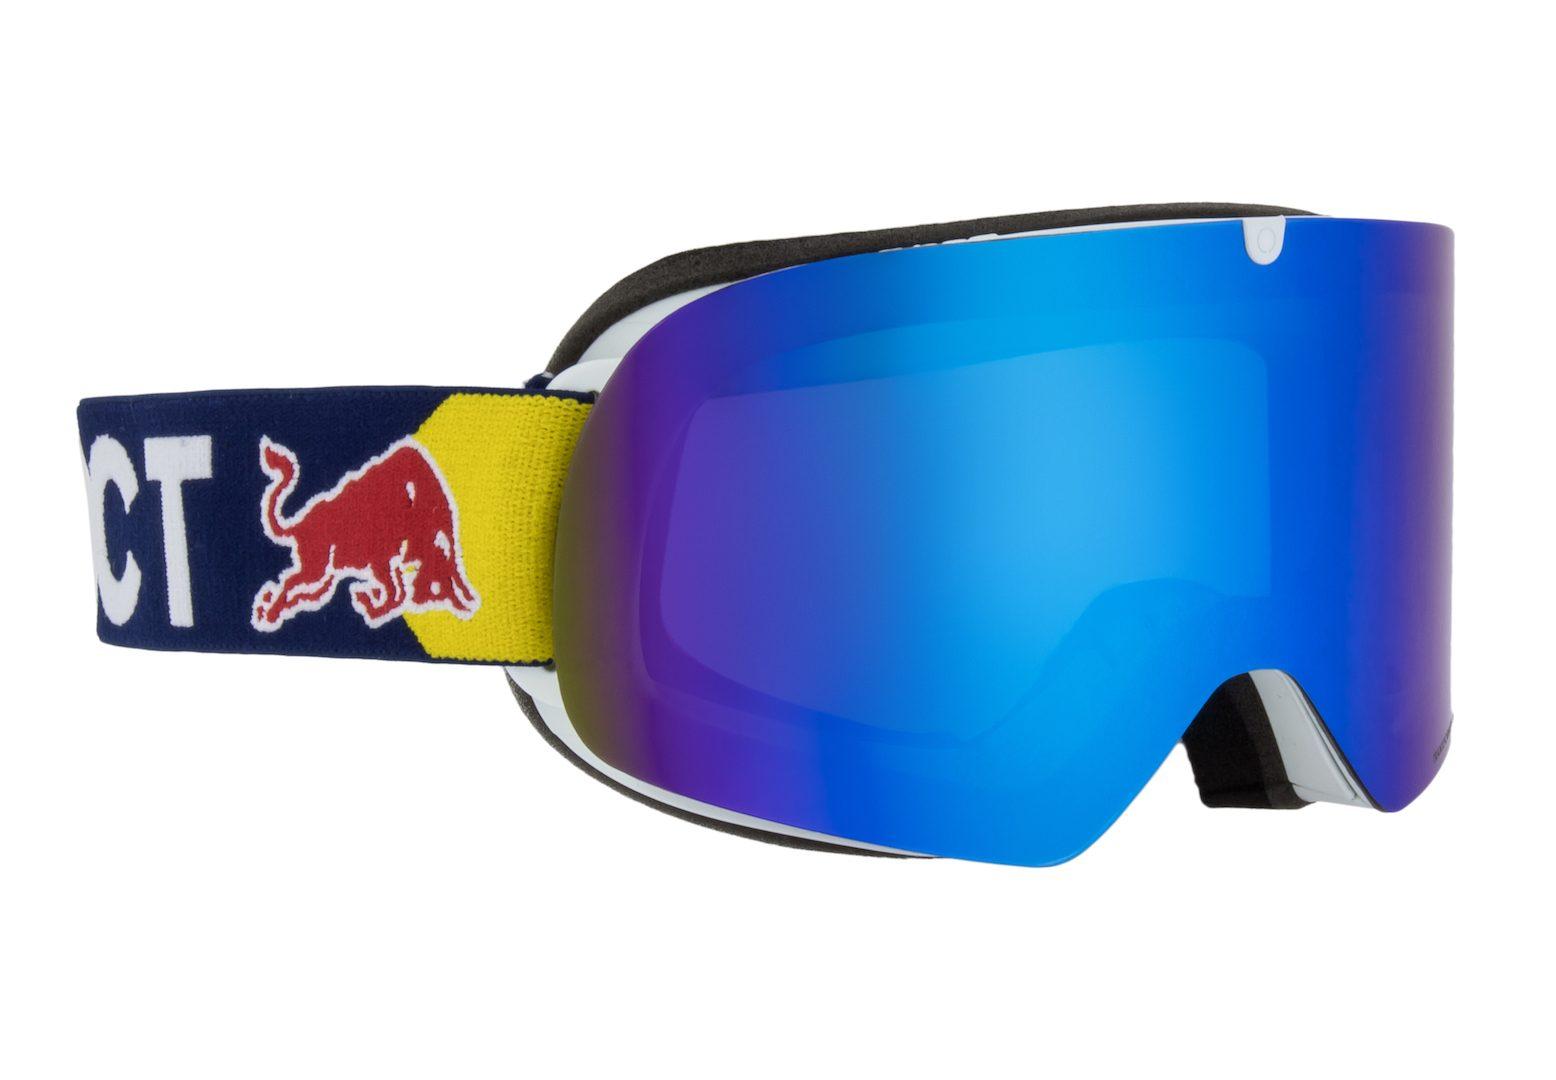 Red Bull SPECT Eyewear FW20/21 Goggles